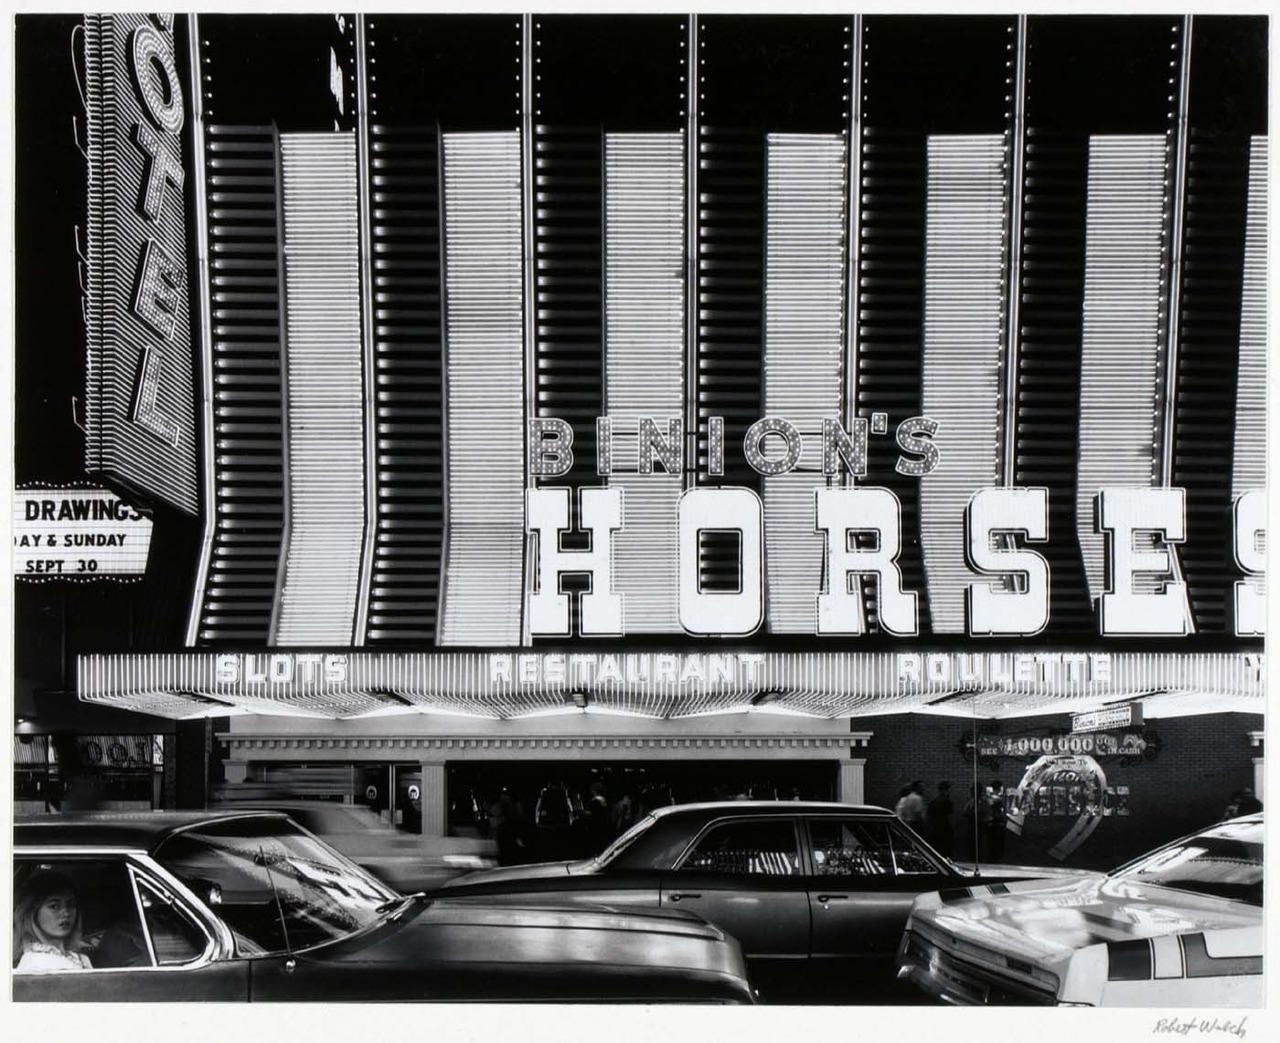 Casino.com Italia | Sinbads Golden Voyage